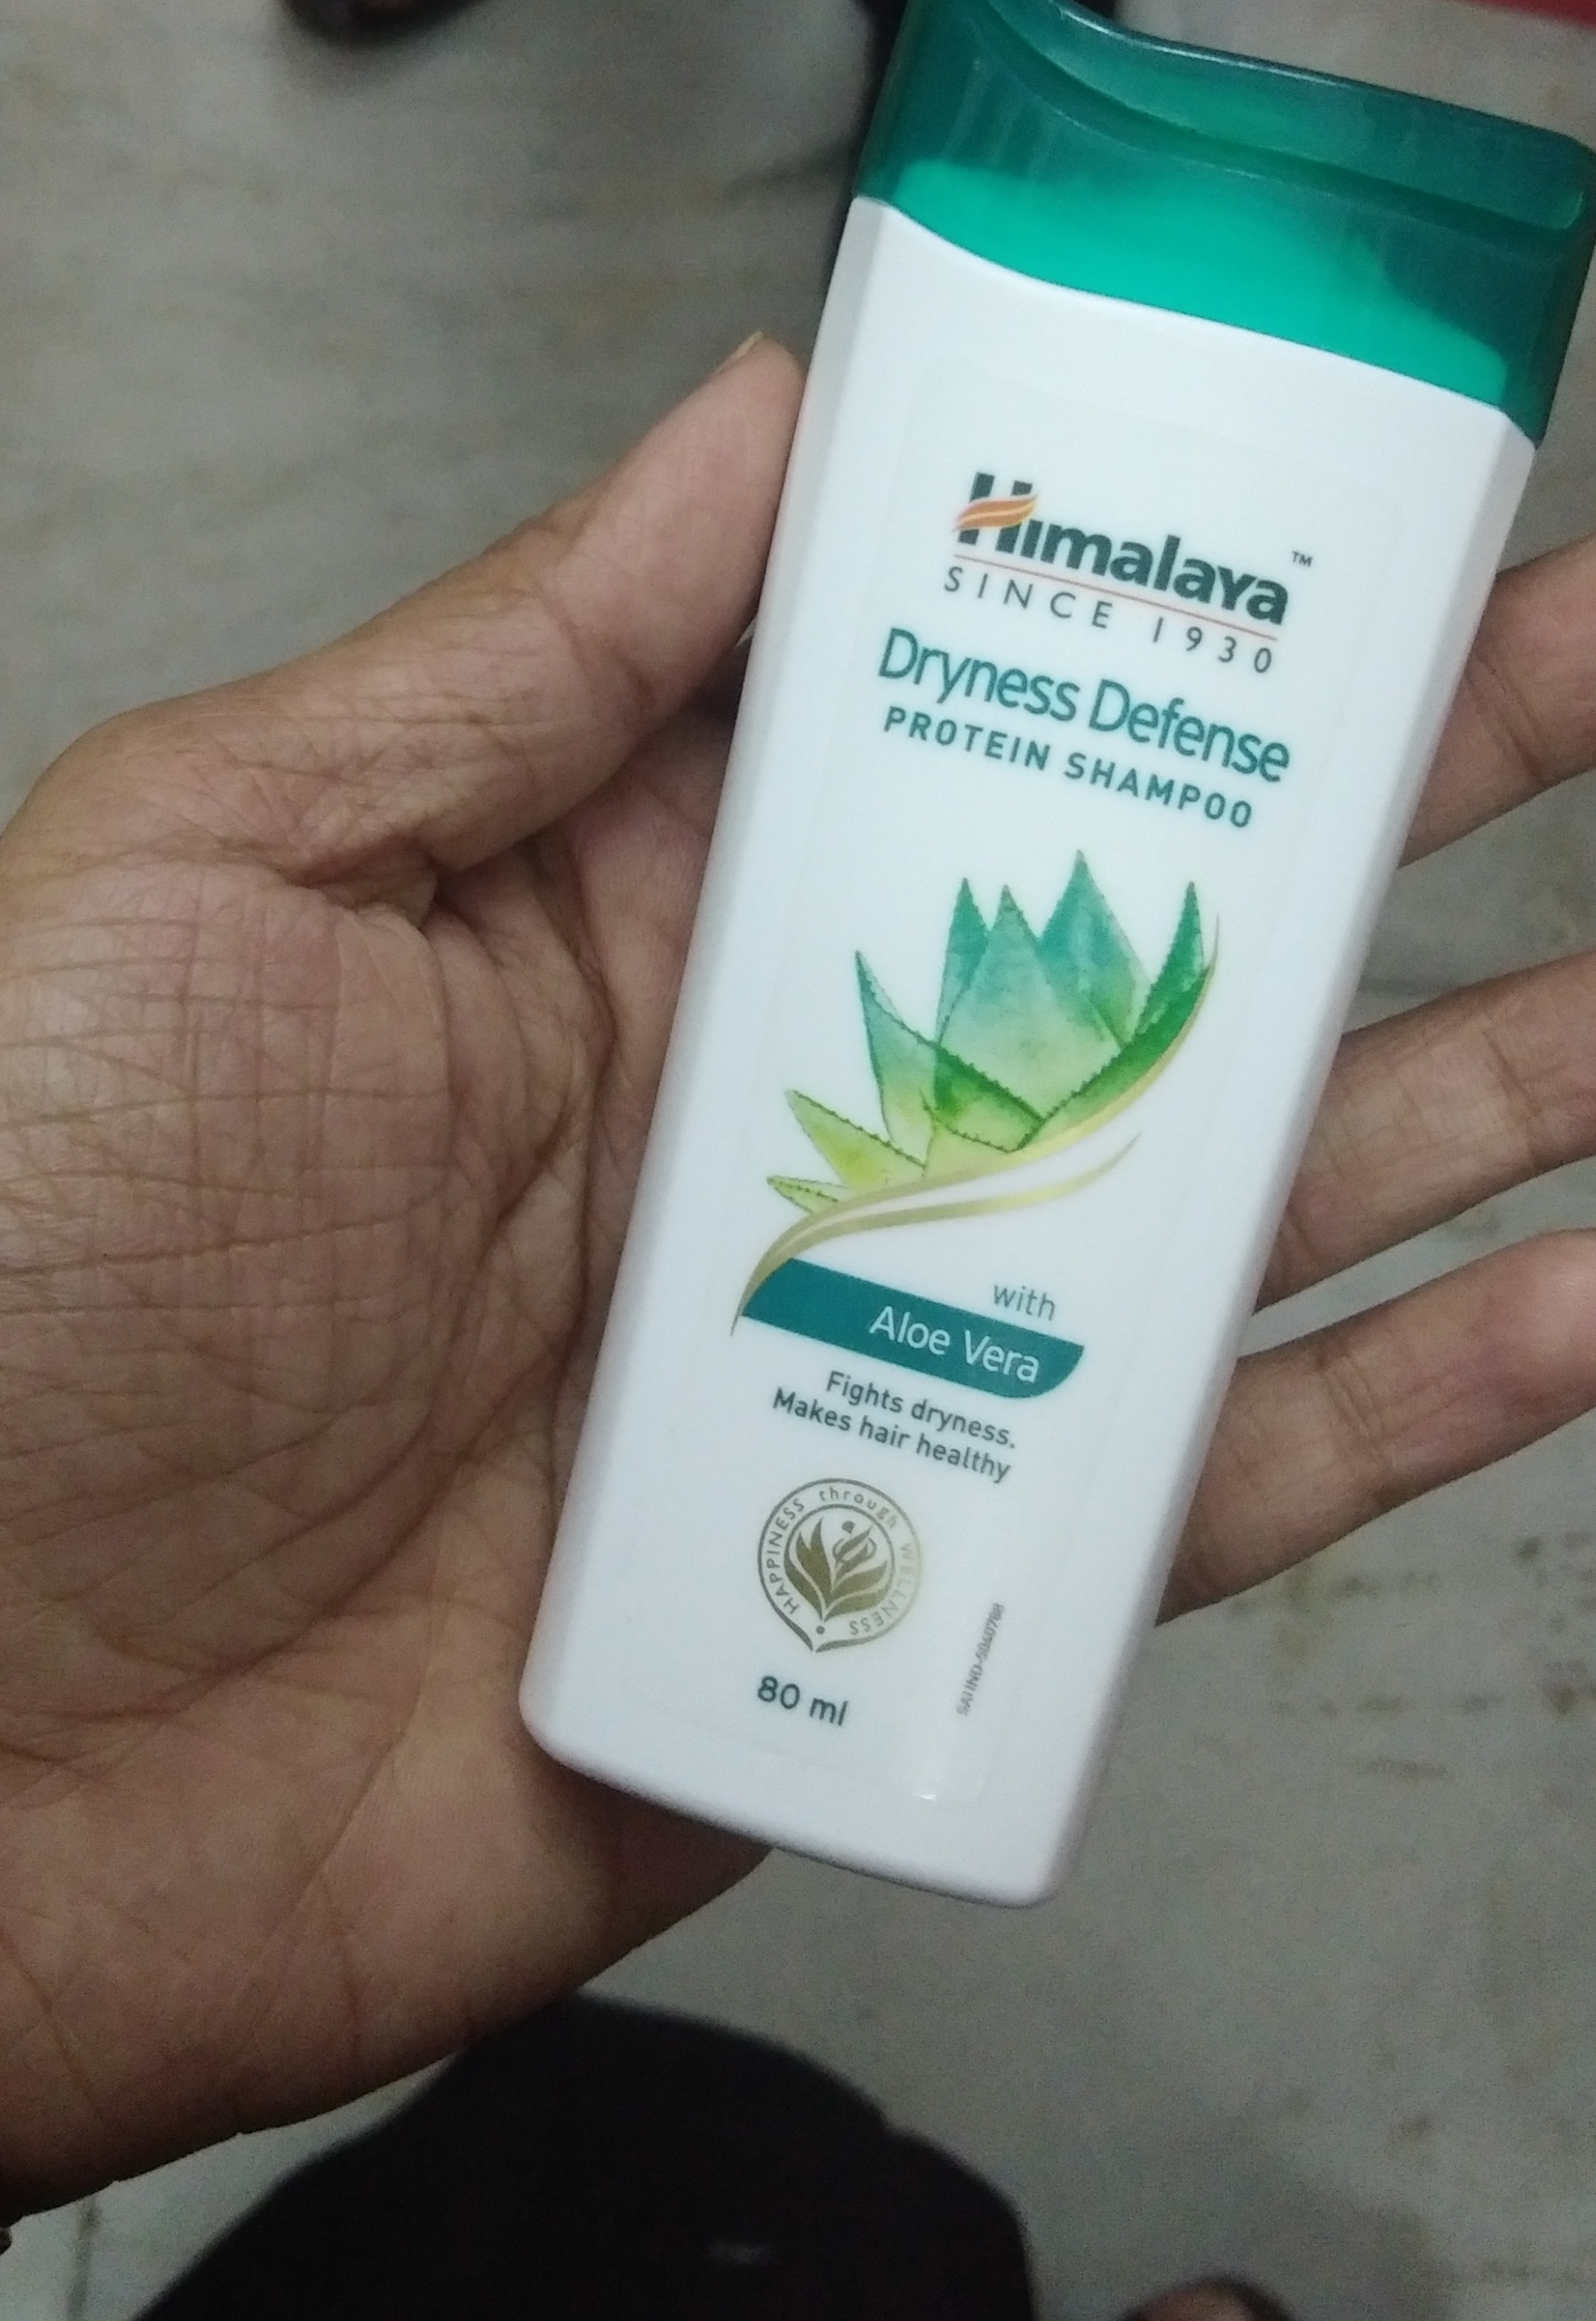 Himalaya Dryness Defense Protein Shampoo-Good one-By Nasreen-2